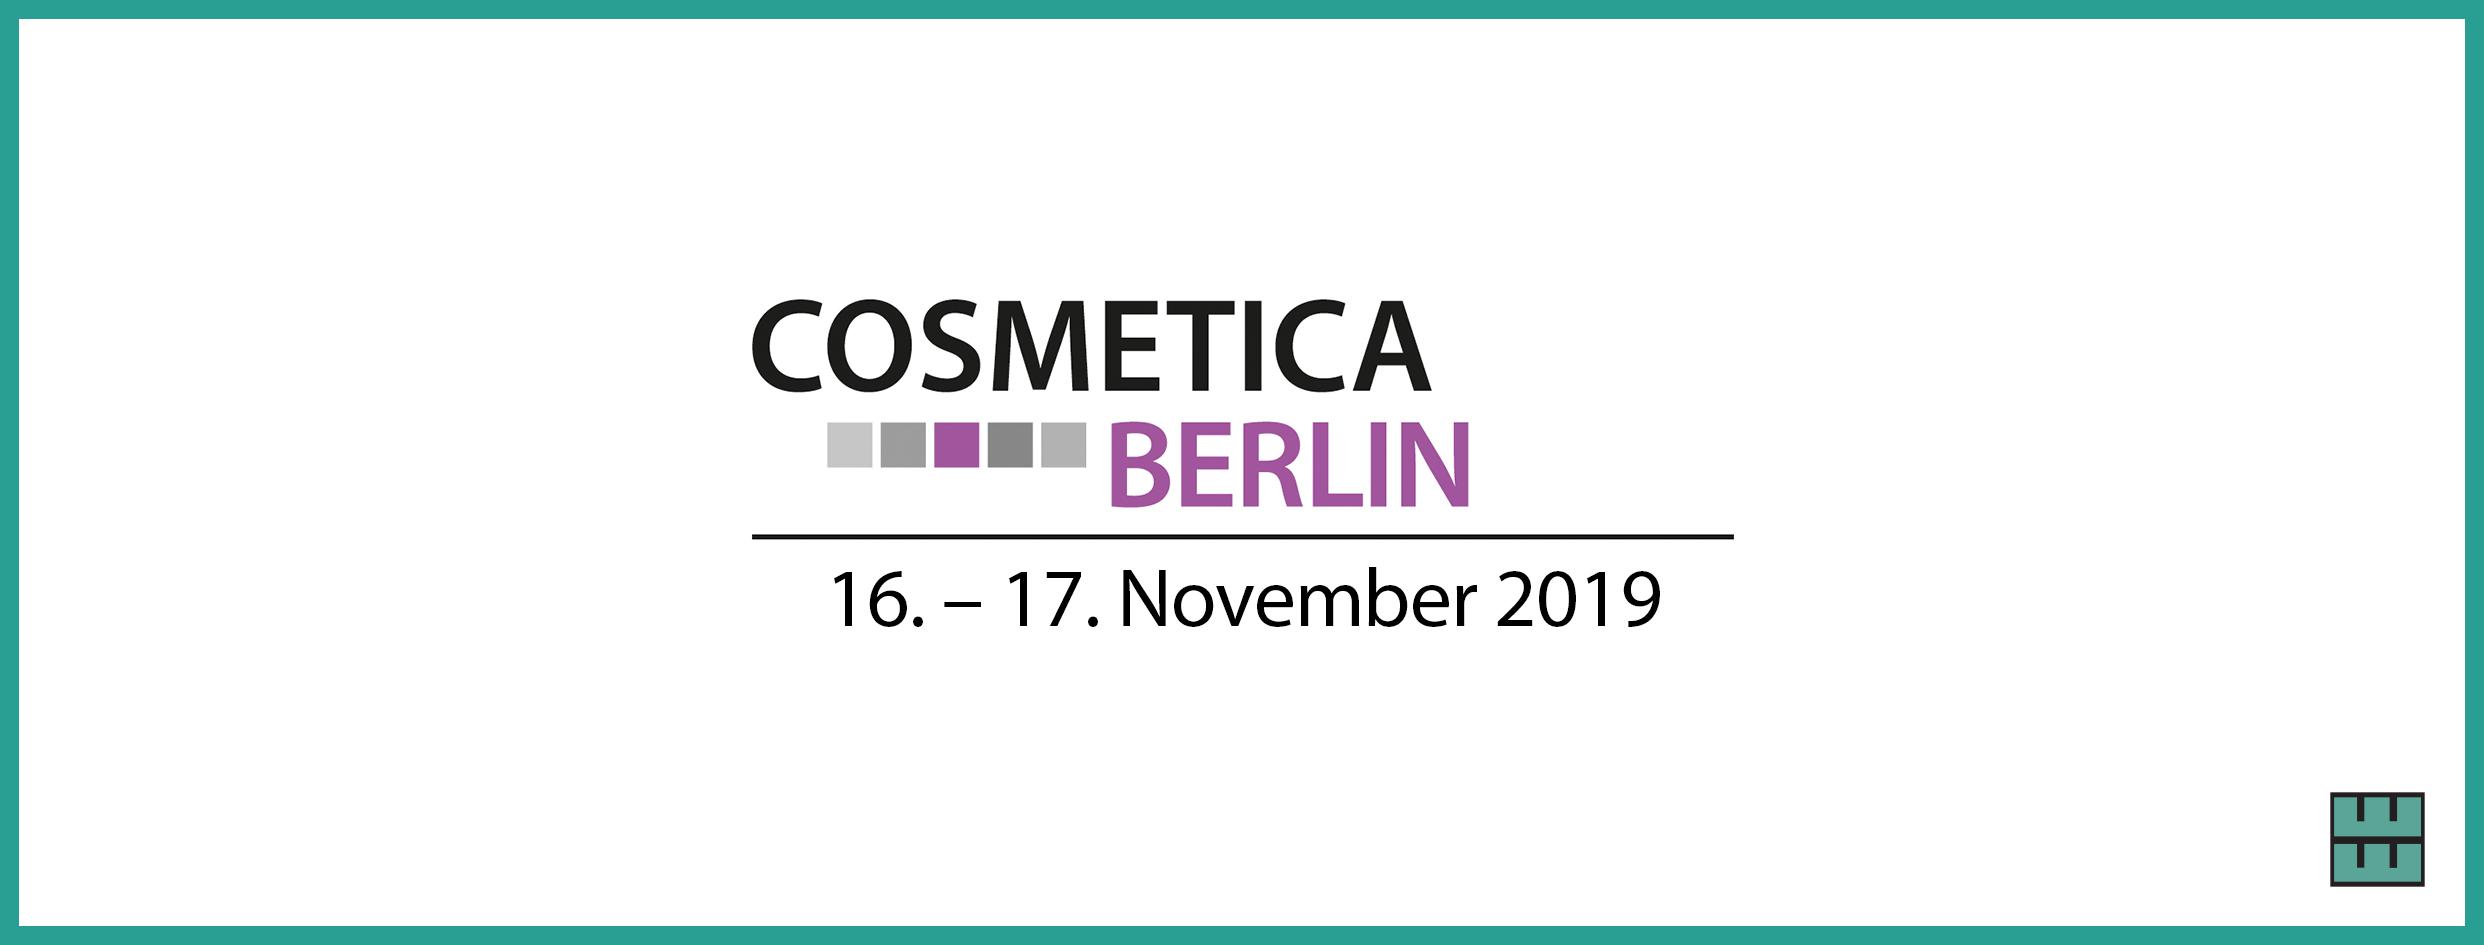 Cosmetica Berlin 2019 Messebau Weber Werbung Niedersachsen